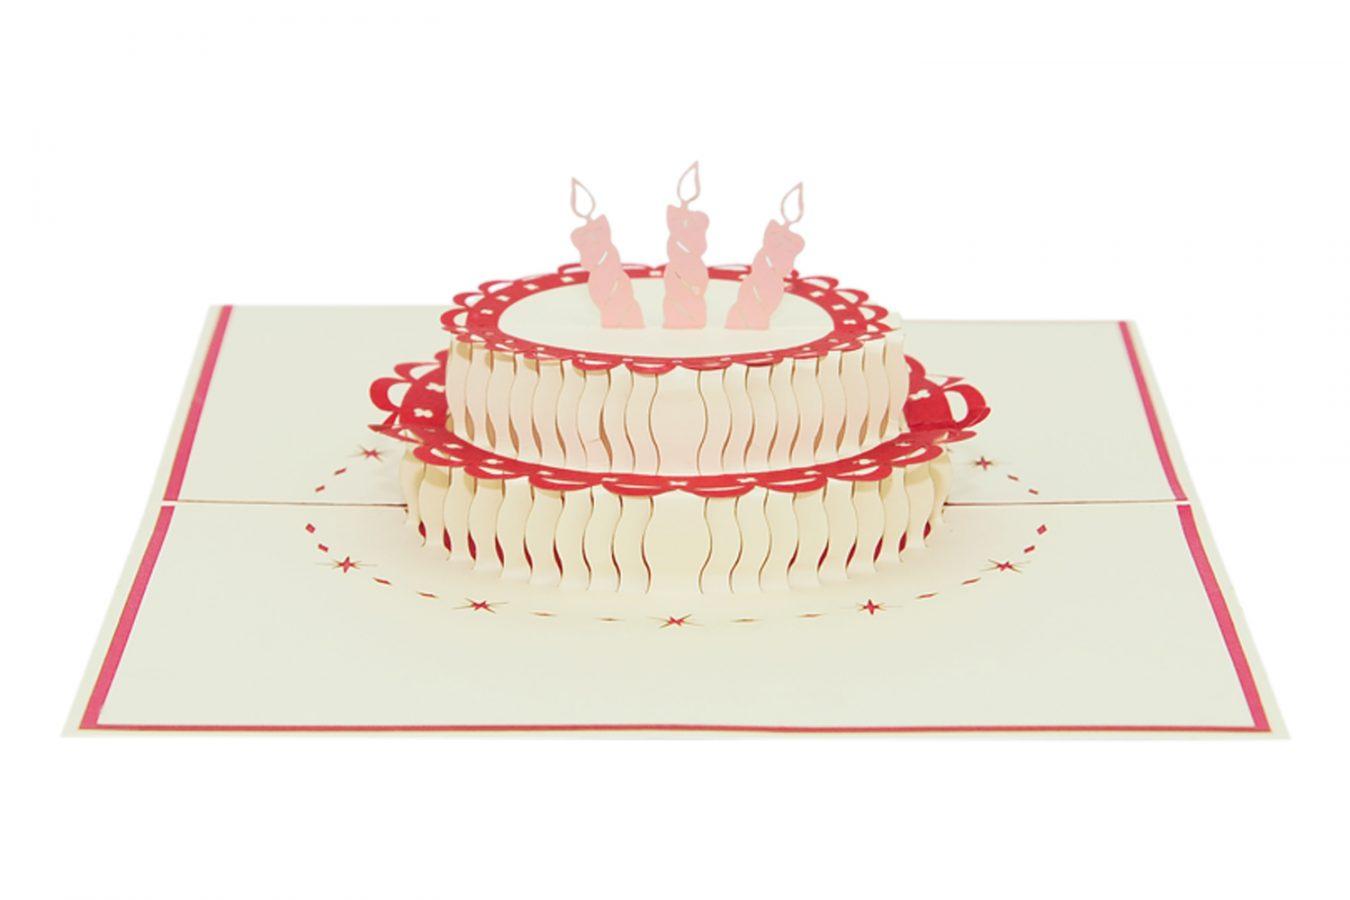 Birthday Cake Pop Up Card Pop Up Card Custom Cards Wholsale Charm Pop